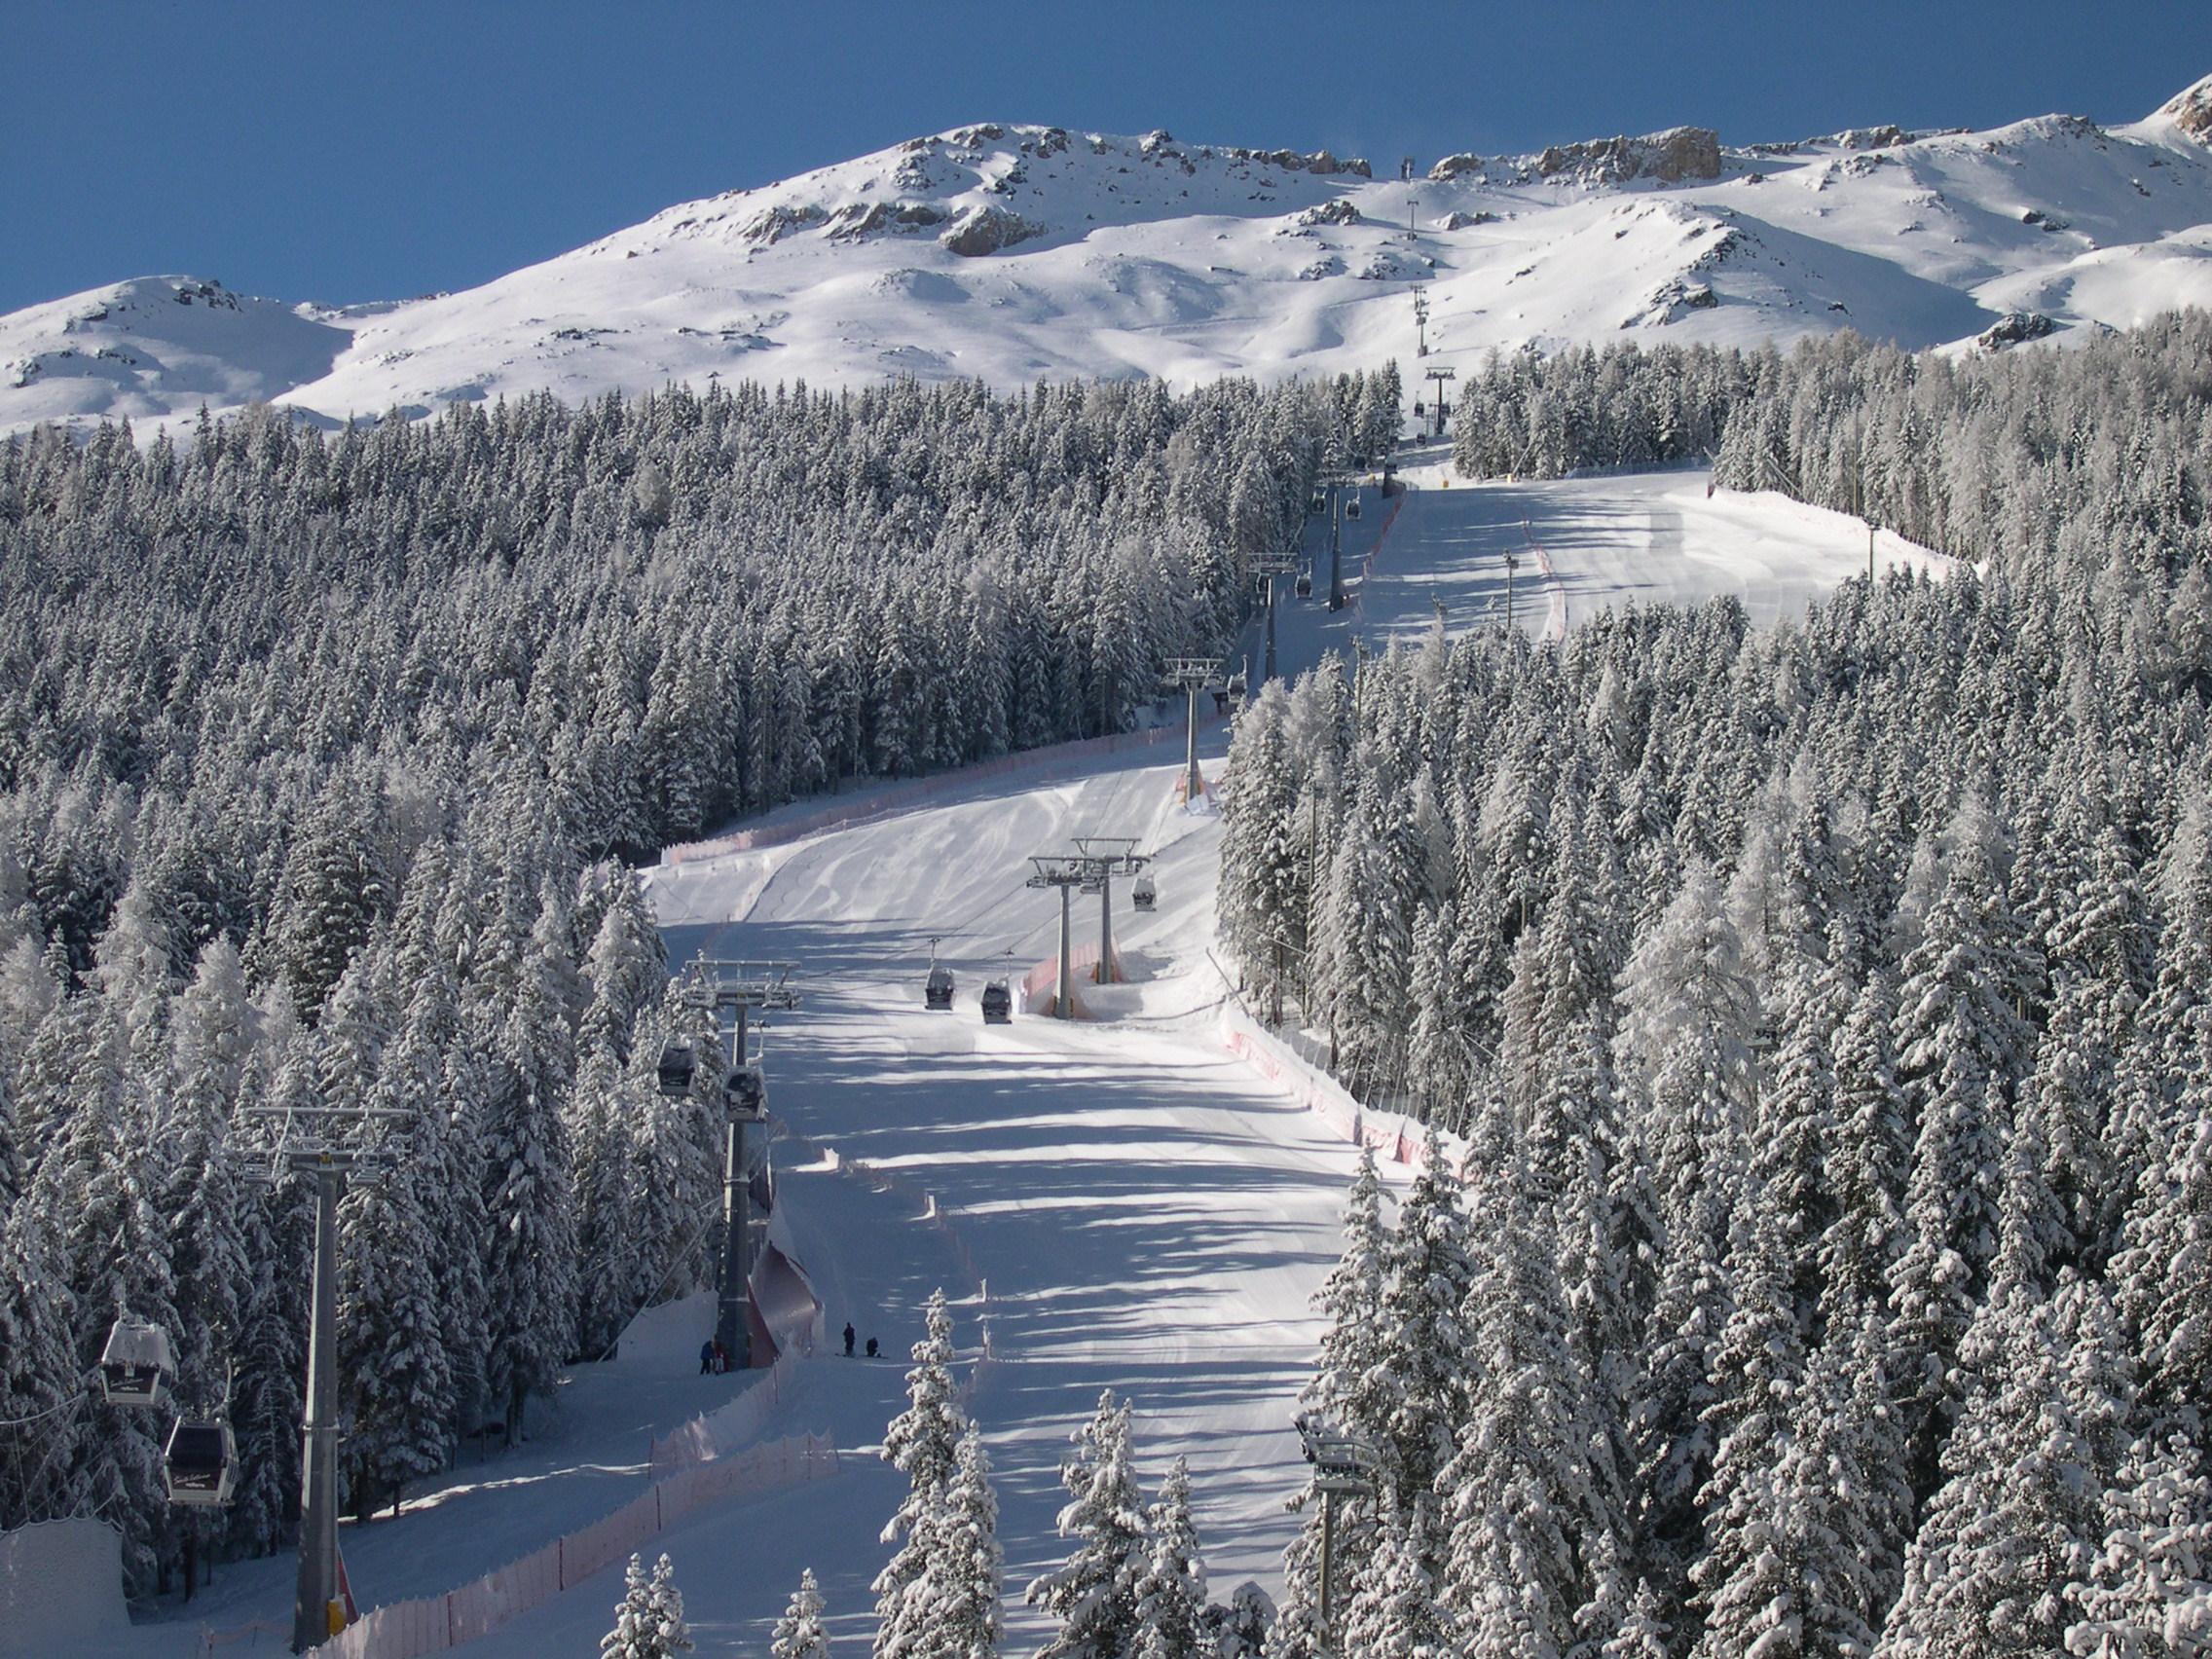 santa caterina valfurva ski area – skiing, ski area map & après-ski